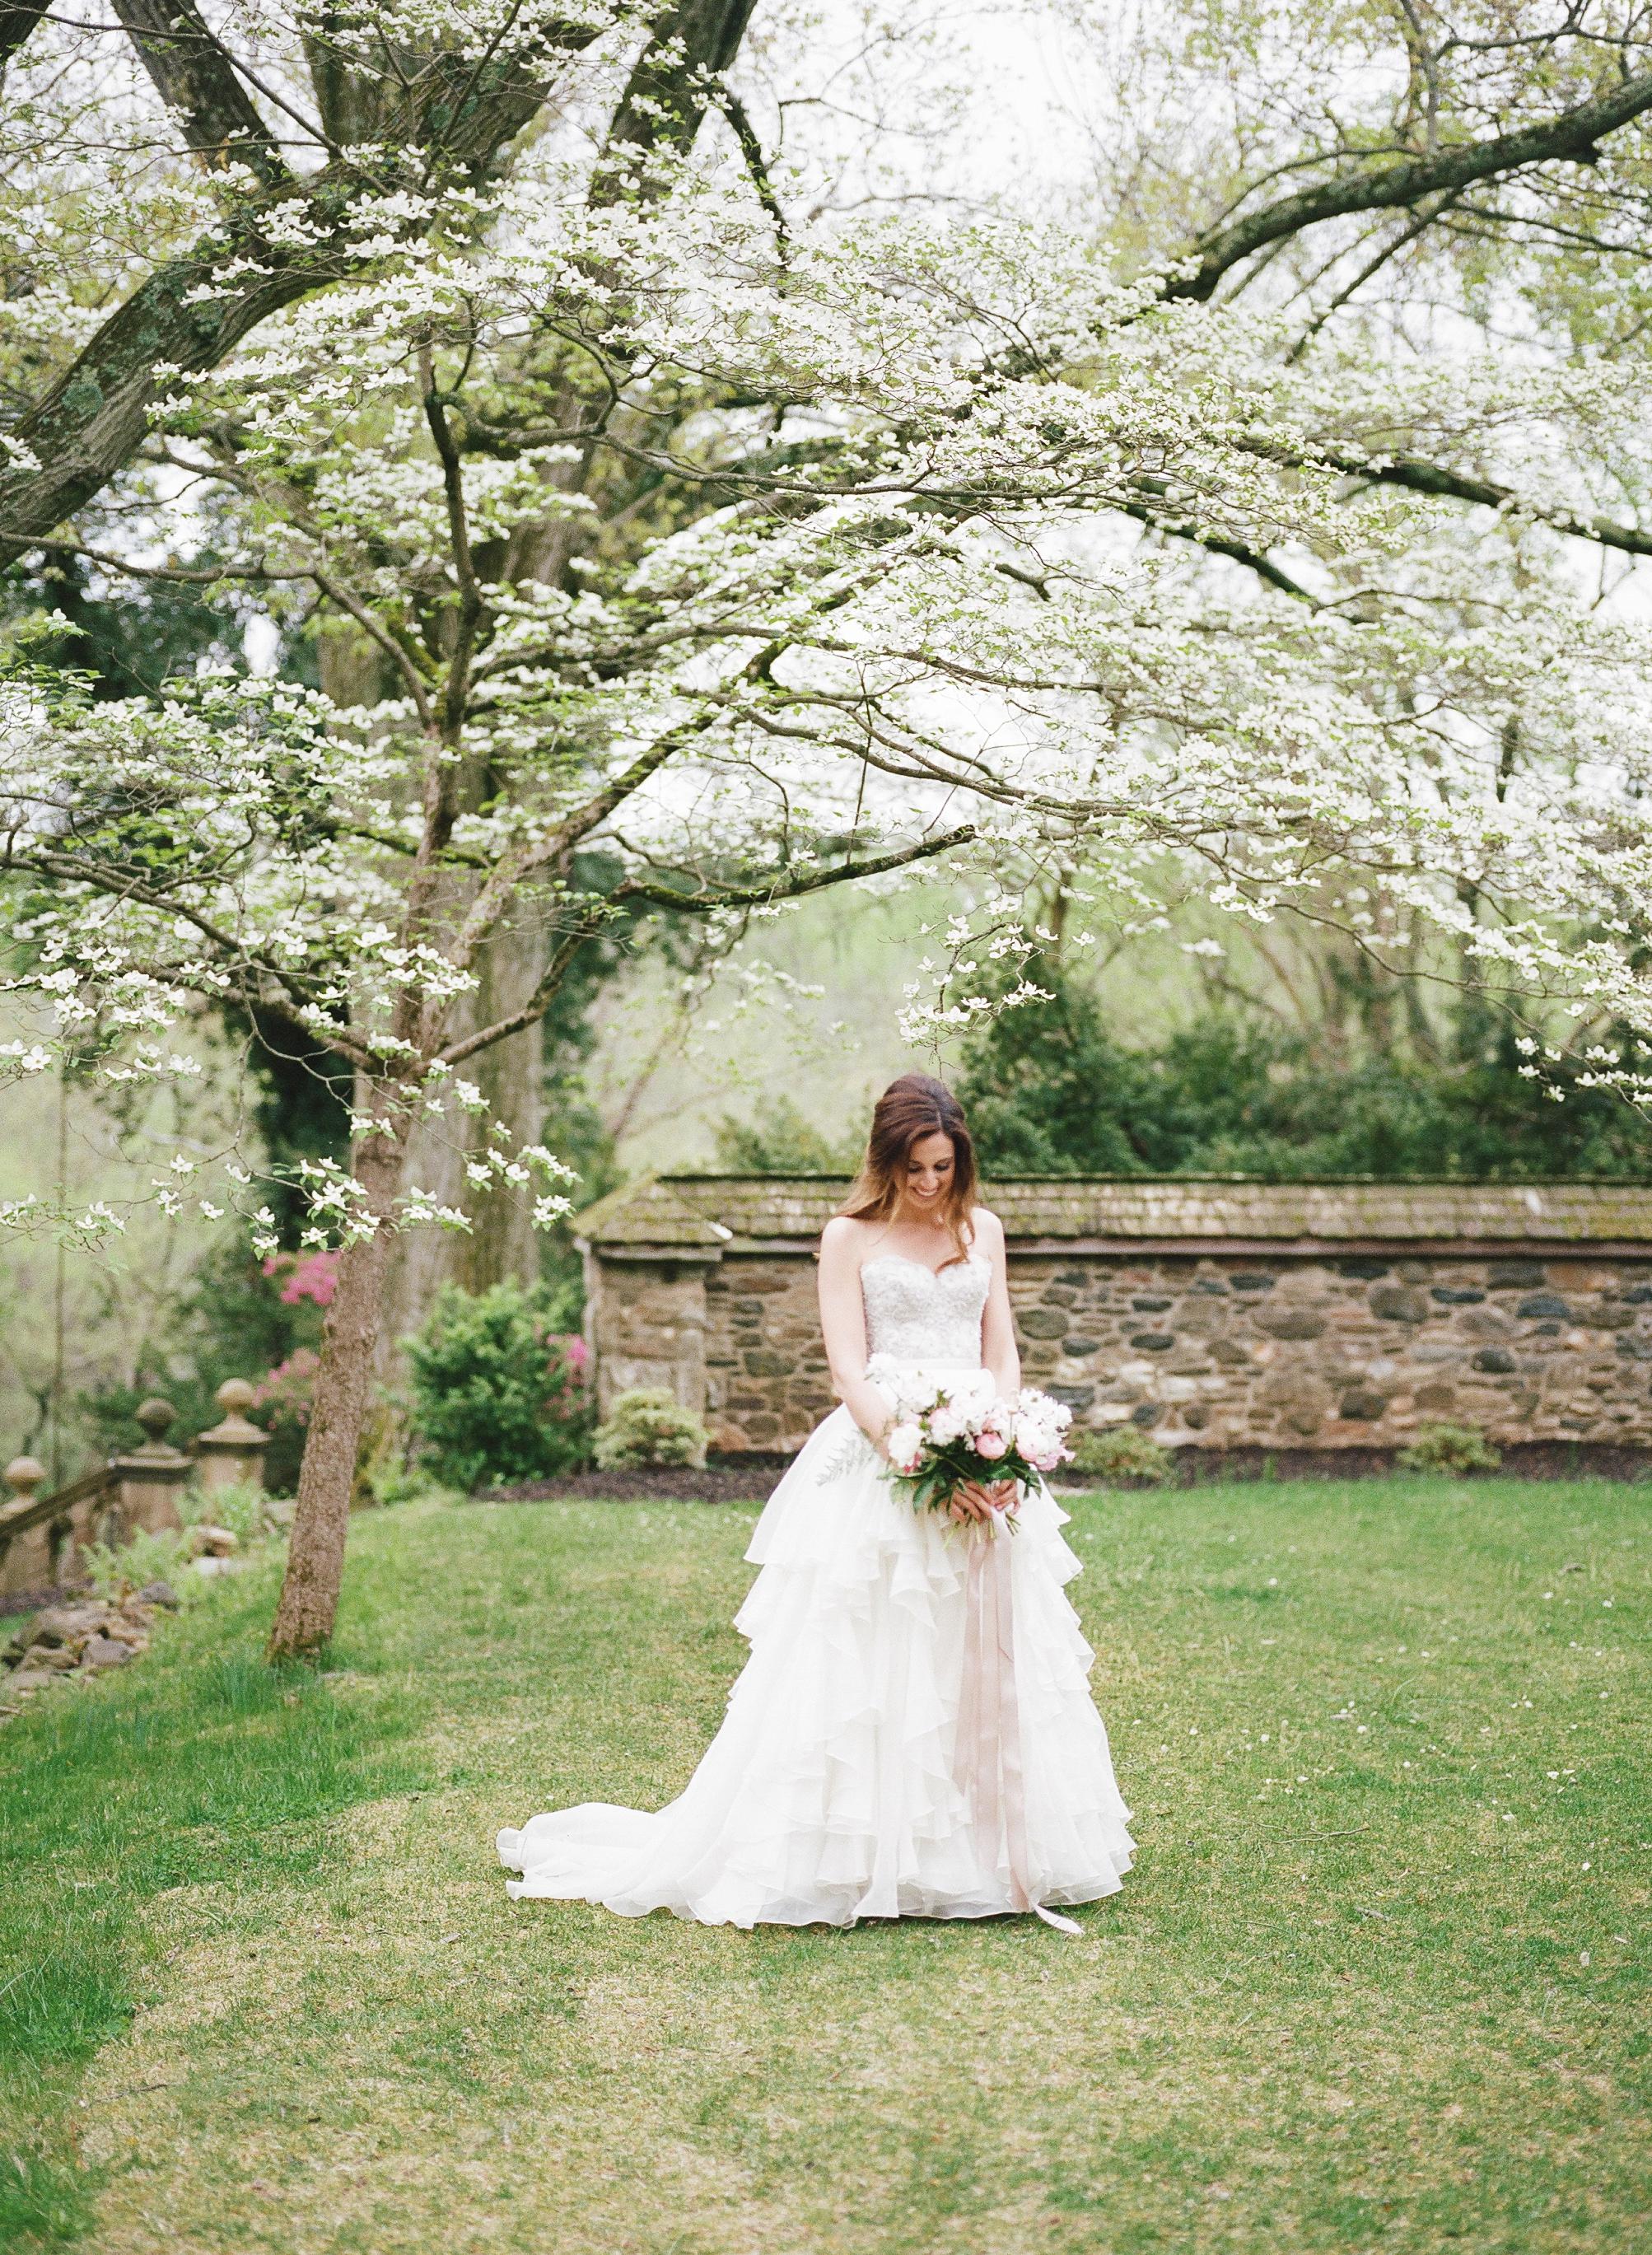 HNP-Modern-Fairytale-Spring-Wedding-Styled-Shoot_073.jpg